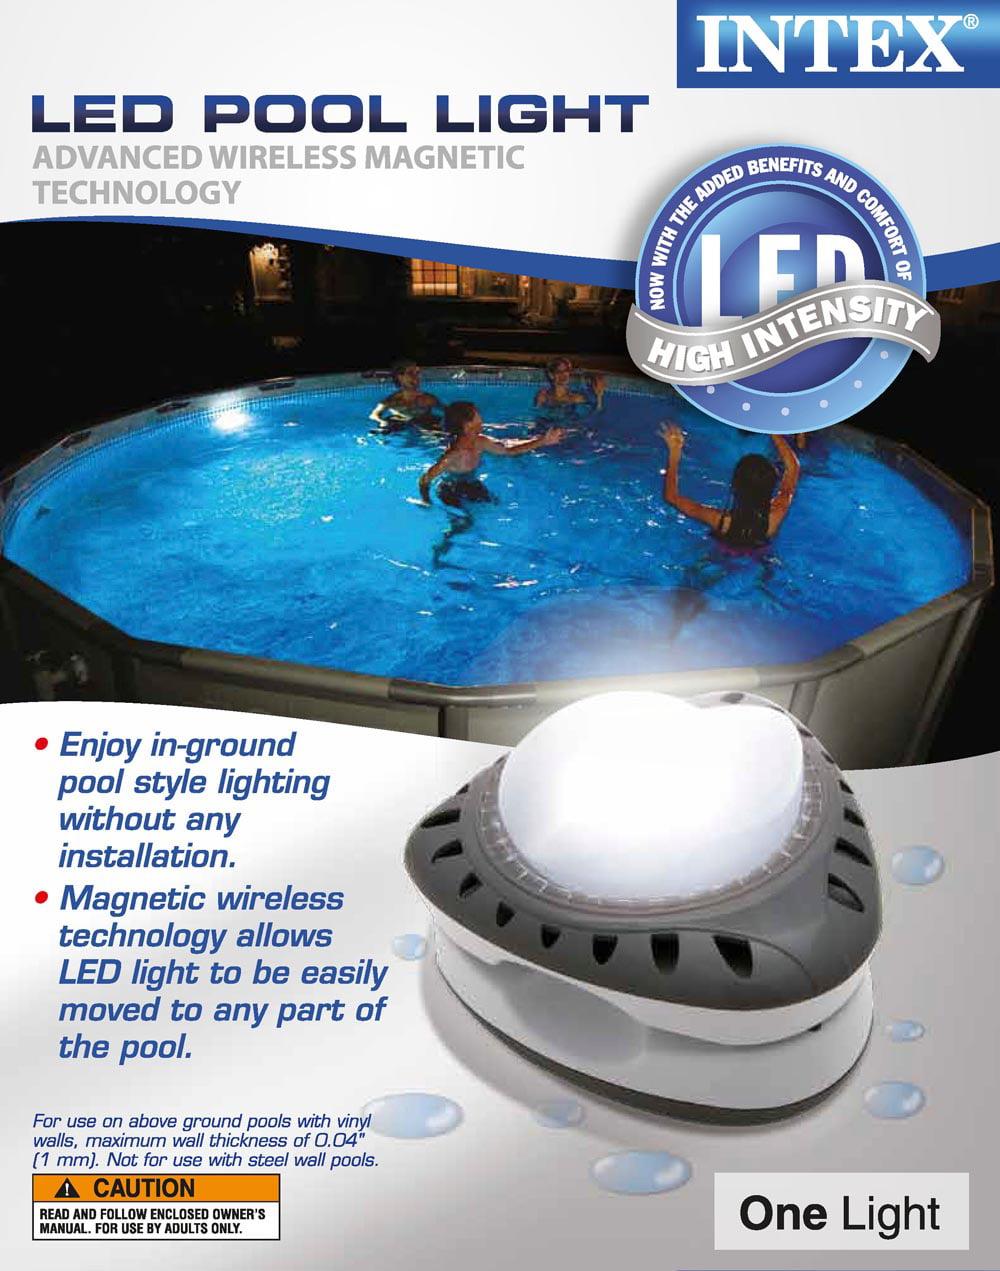 Intex above ground energy efficient led magnetic swimming pool wall intex above ground energy efficient led magnetic swimming pool wall light 28687e walmart aloadofball Choice Image